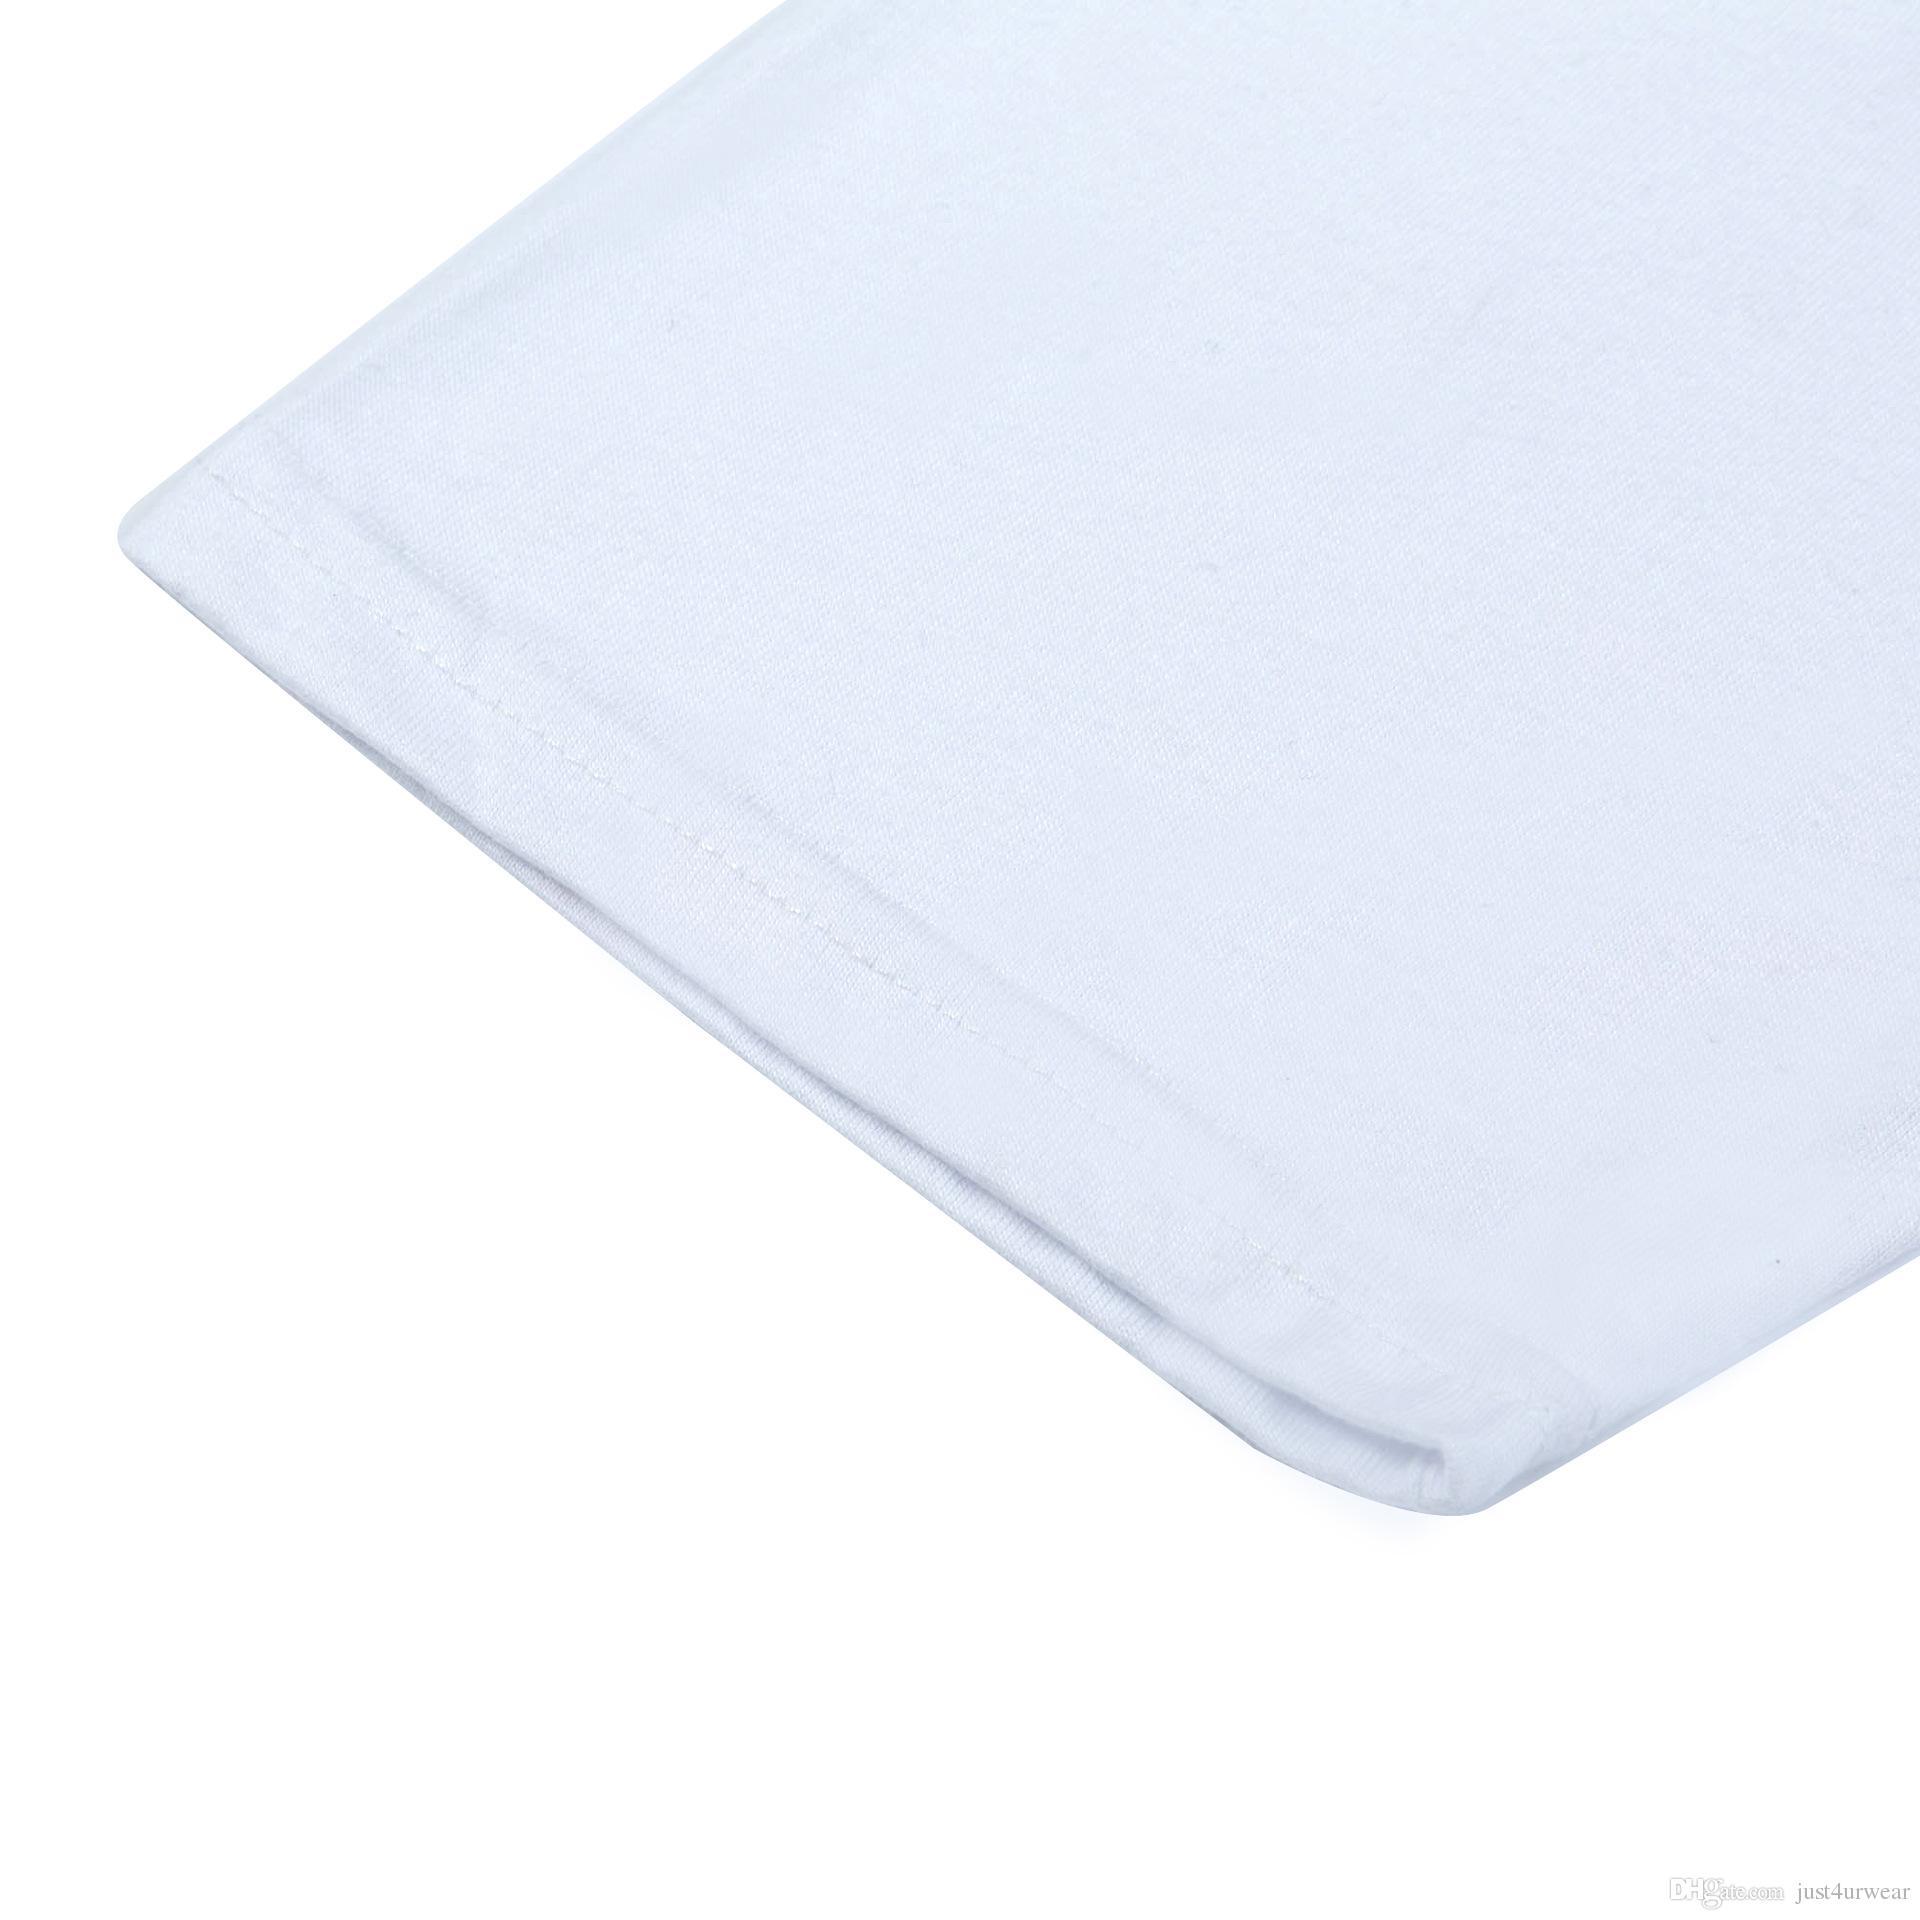 Street Long Tshirt Men Summer Clothing Classical Zippers Up Black White Tees Black White Tops